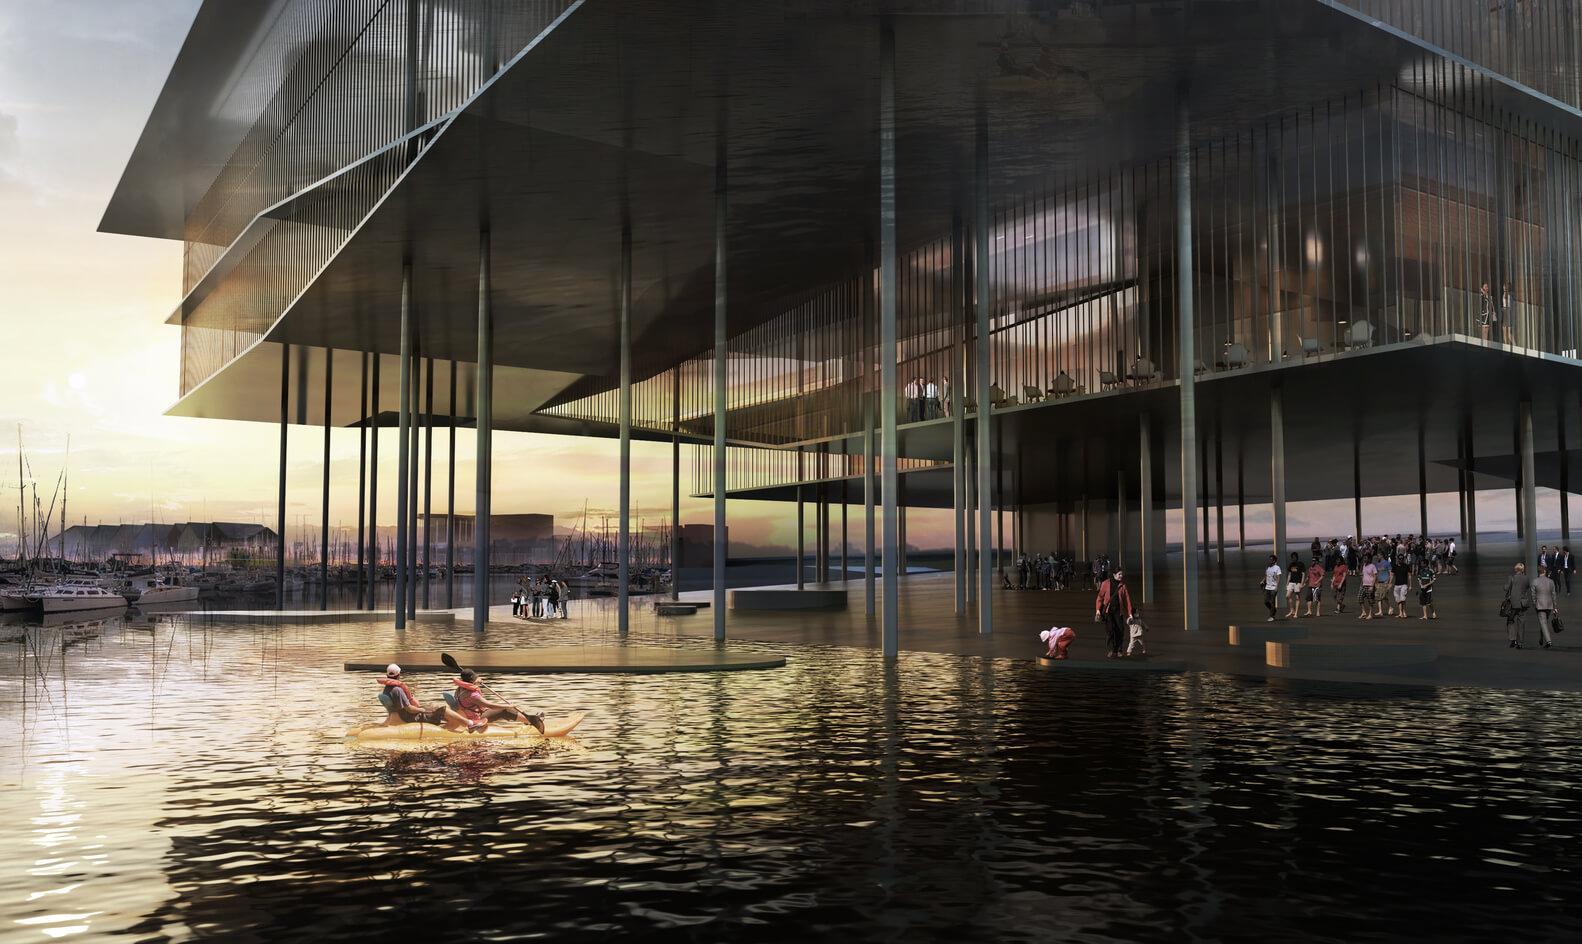 Desain Kantor Situs Warisan Dunia UNESCO di Laut Wadden - 1 - ArchDaily - BeliSewaRumah